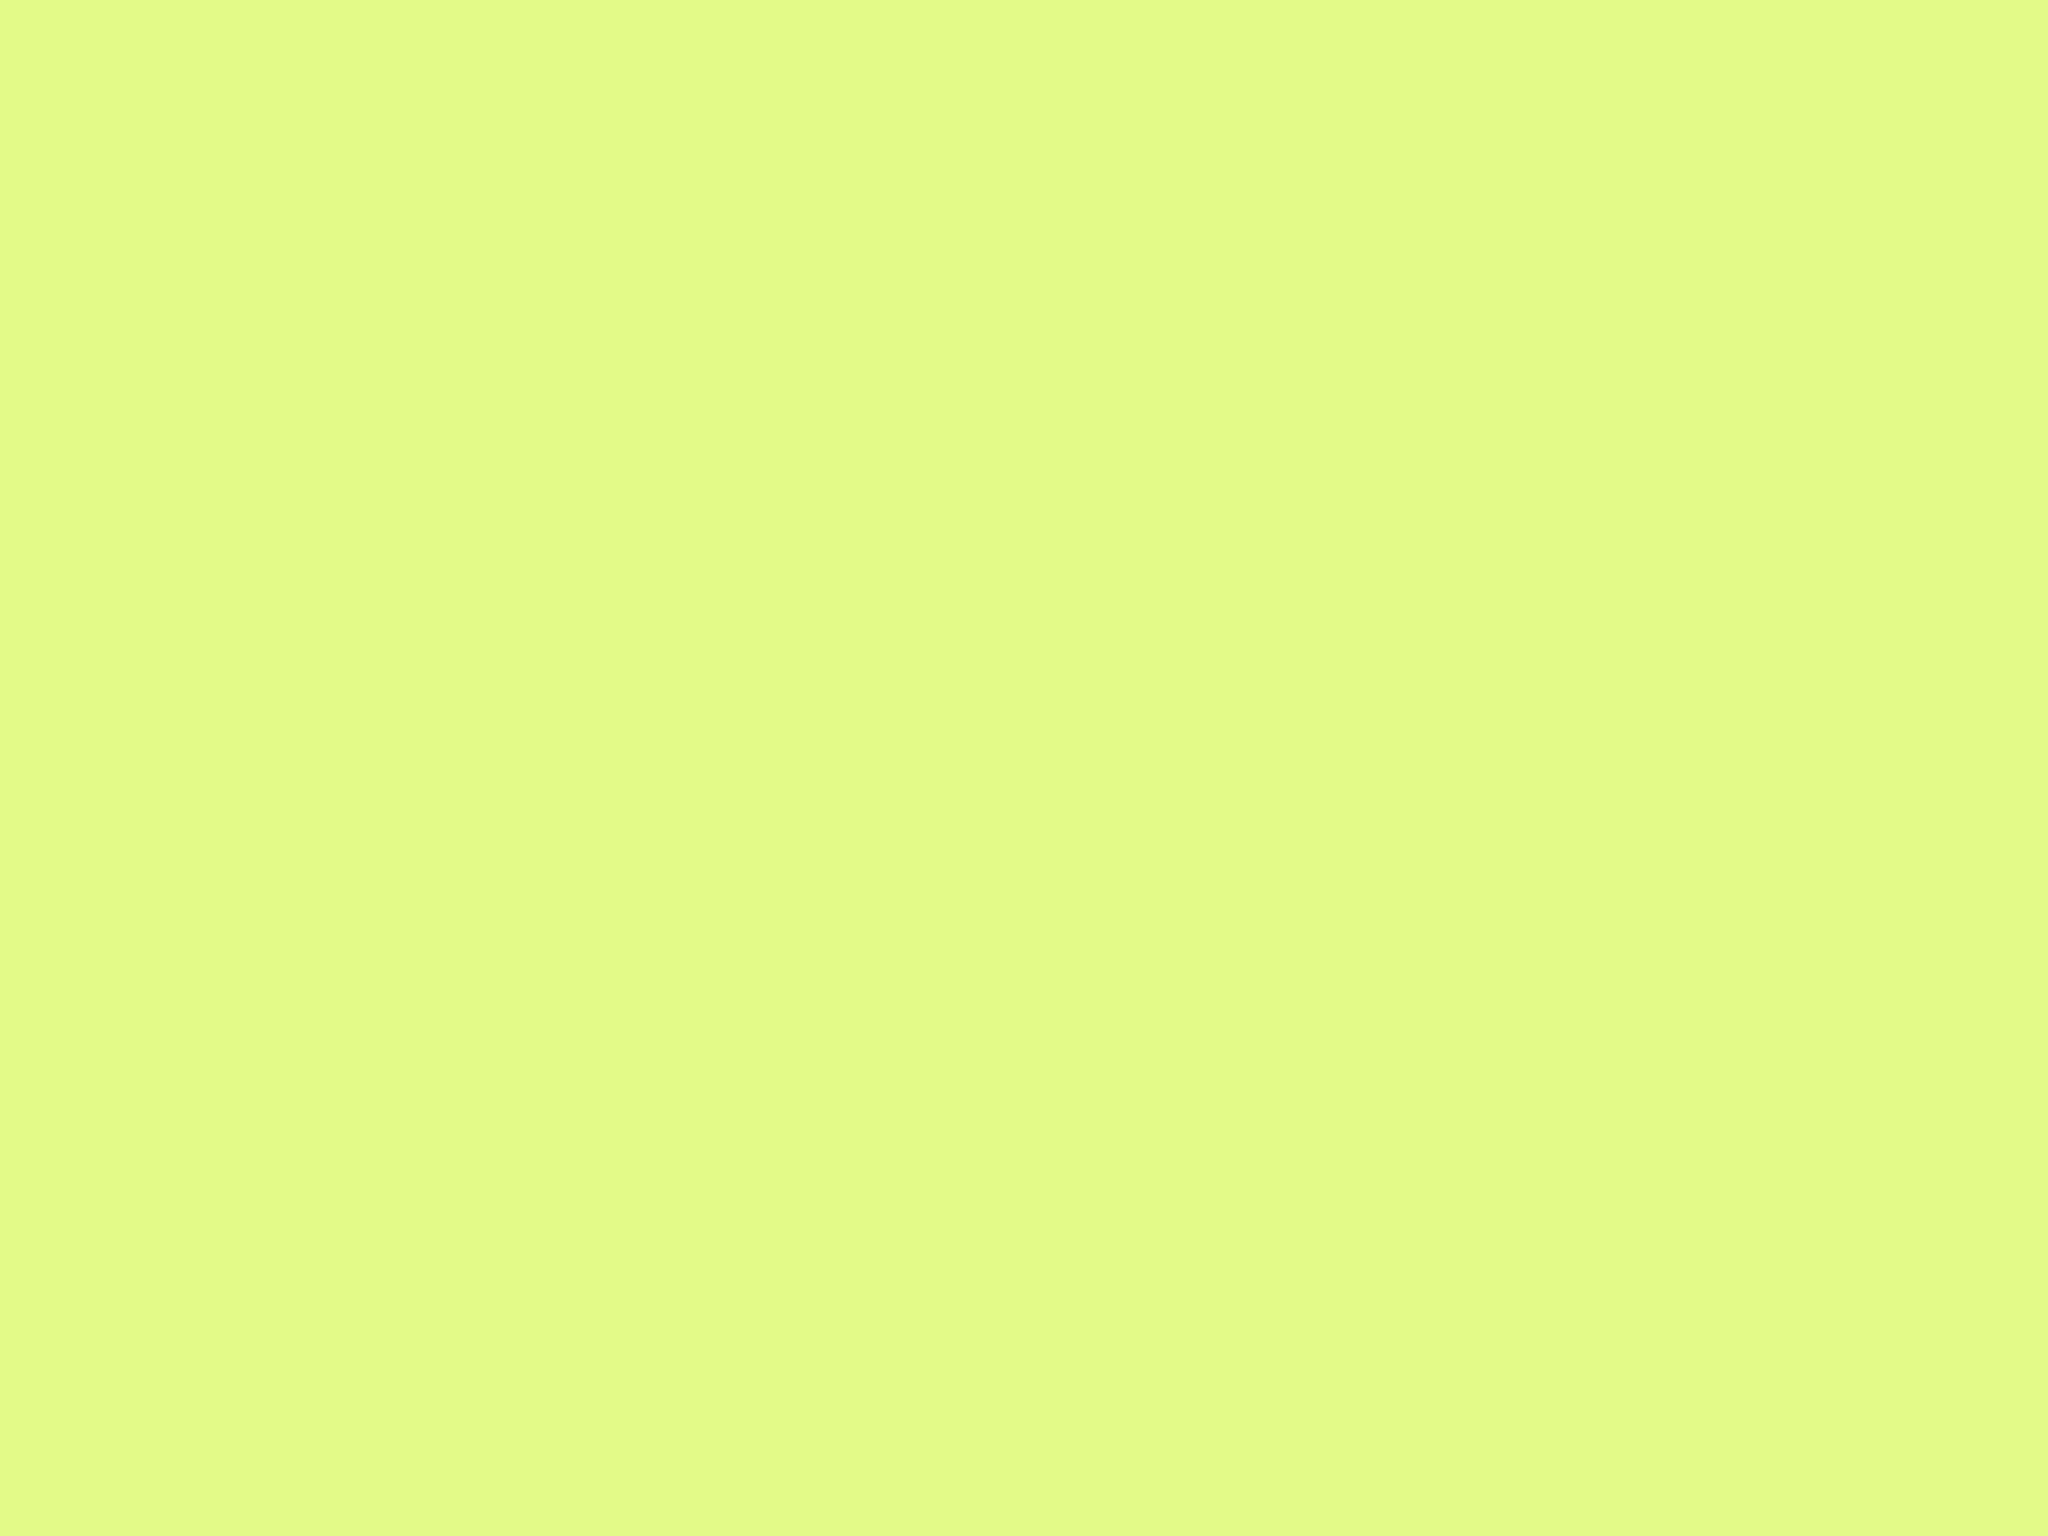 2048x1536 Midori Solid Color Background